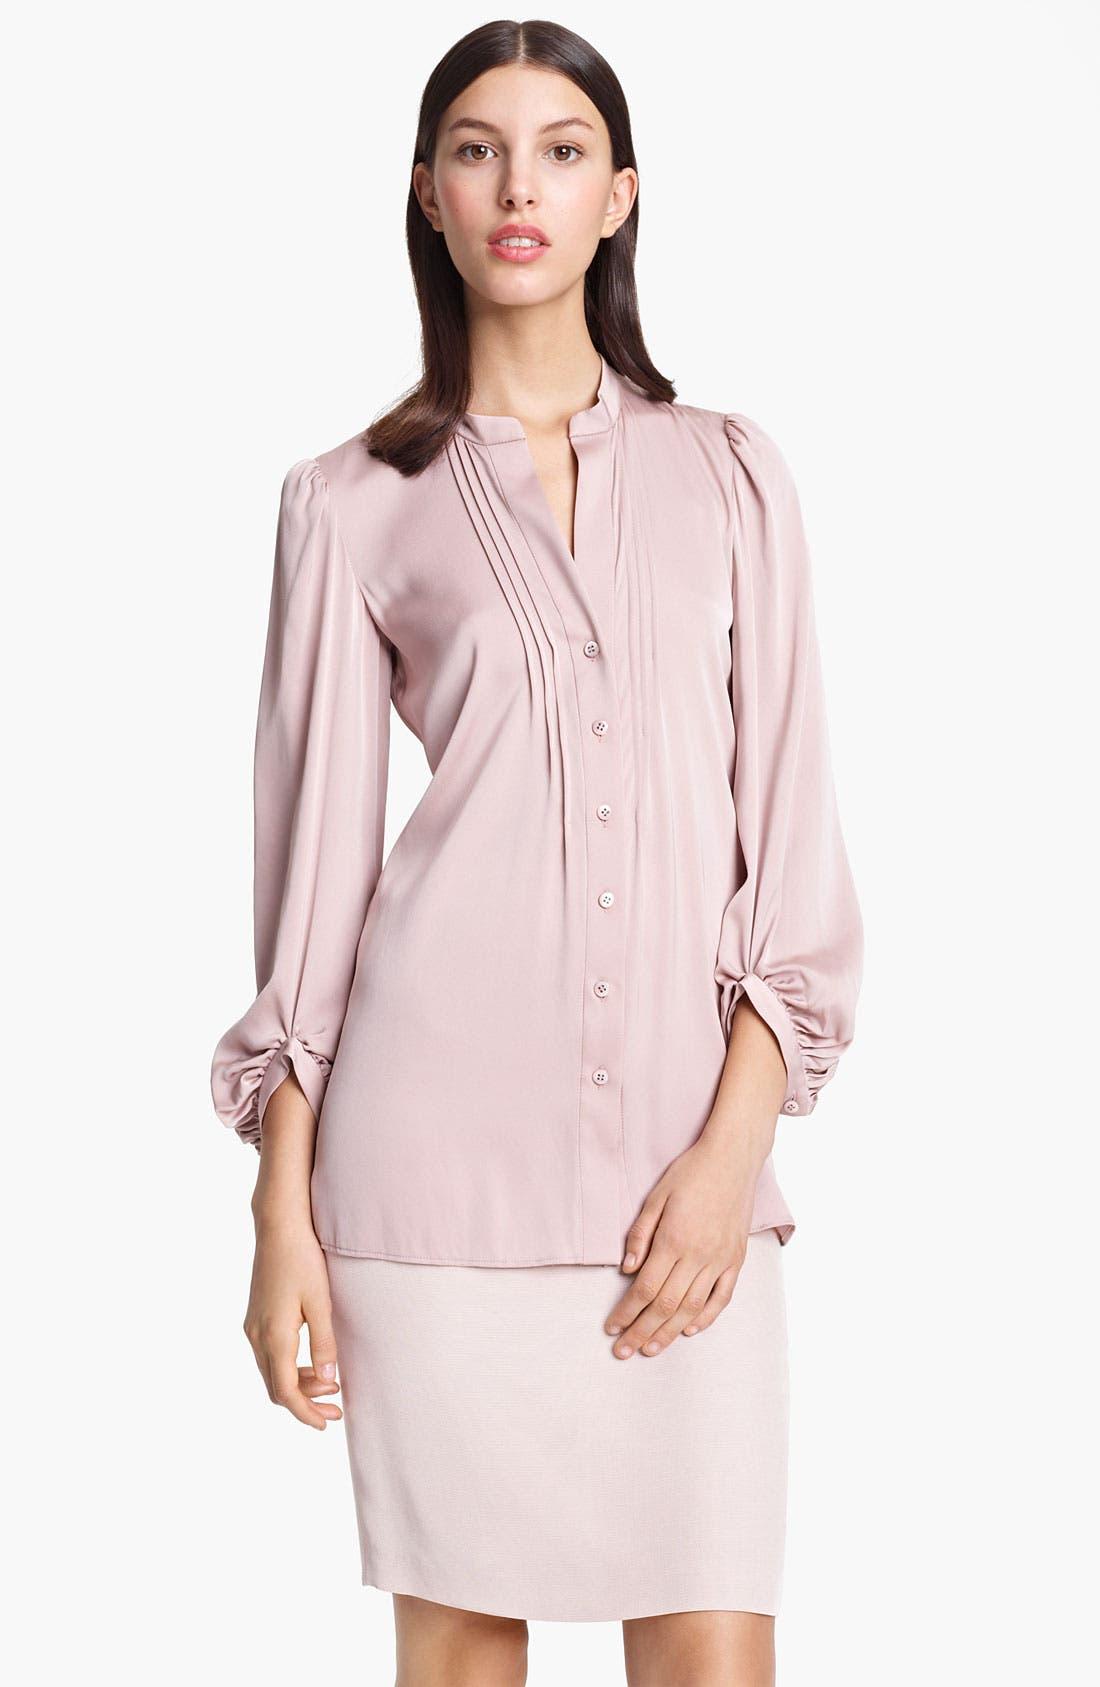 Alternate Image 1 Selected - Armani Collezioni Pleated Stretch Silk Blouse